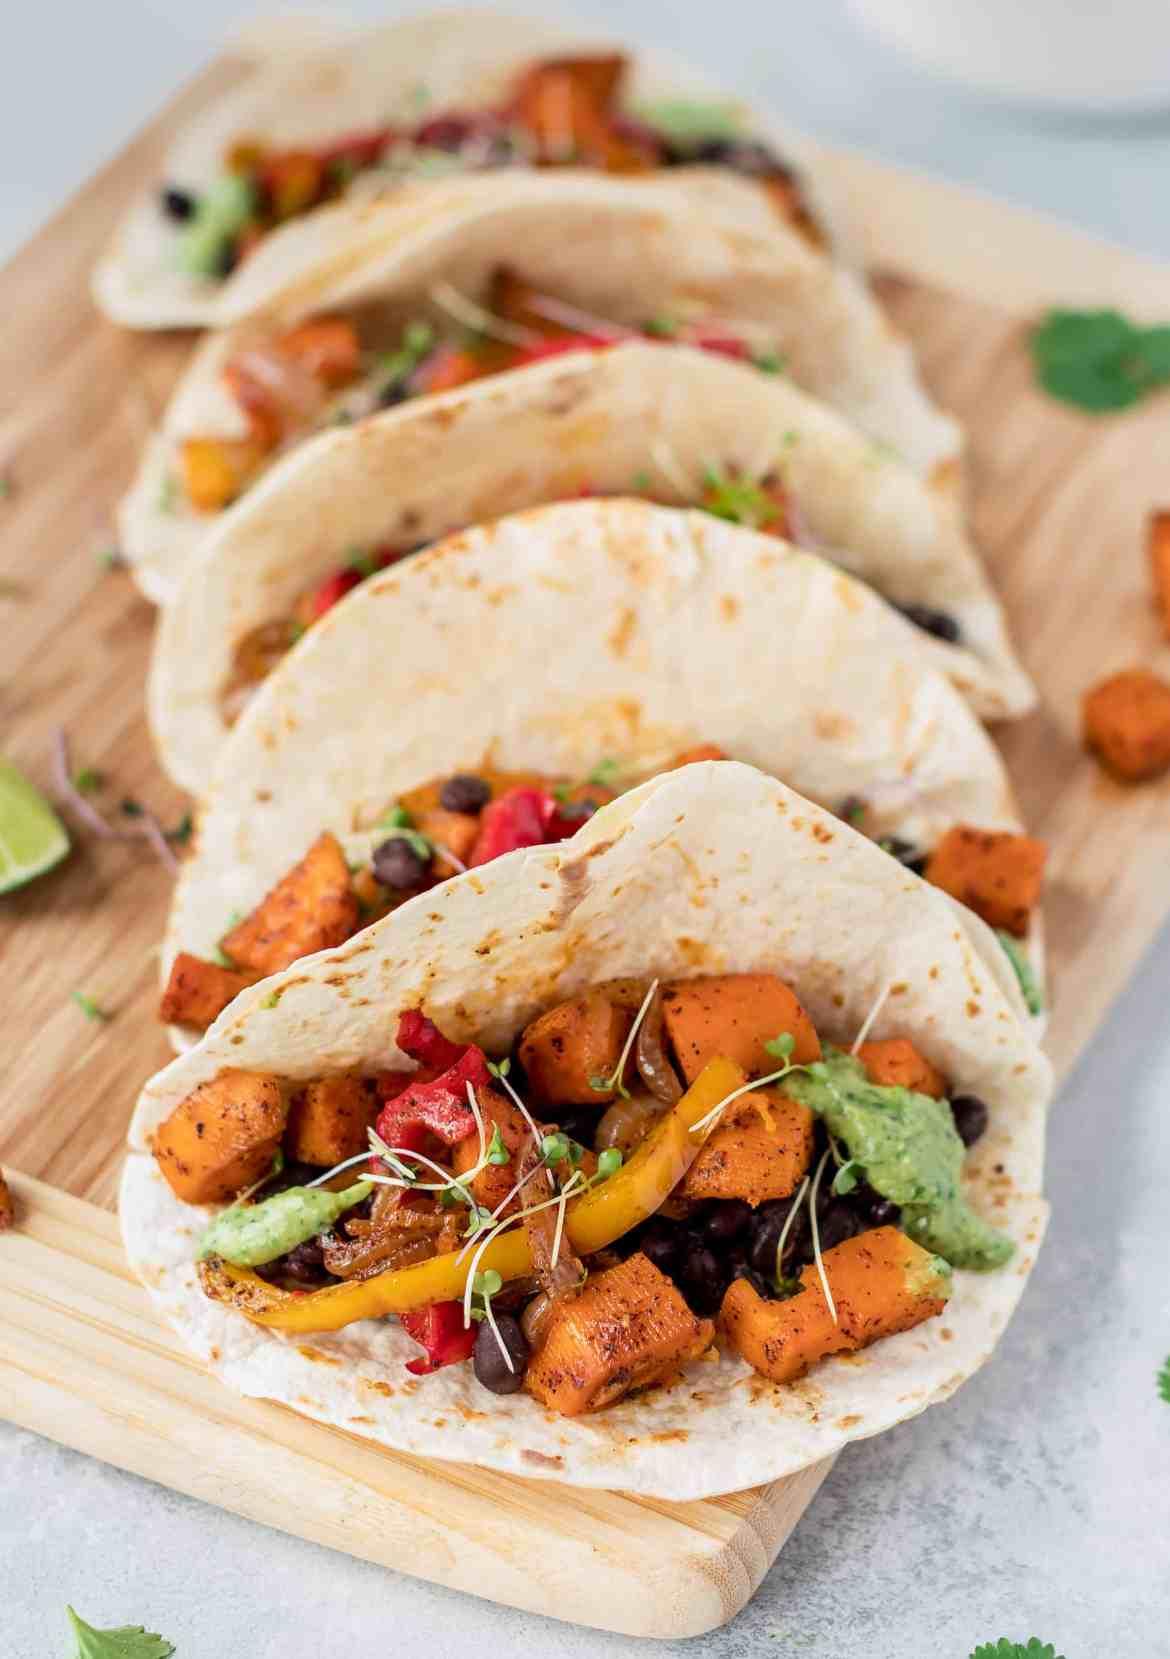 Roasted Sweet Potato & Black Bean Tacos with Avocado Cream